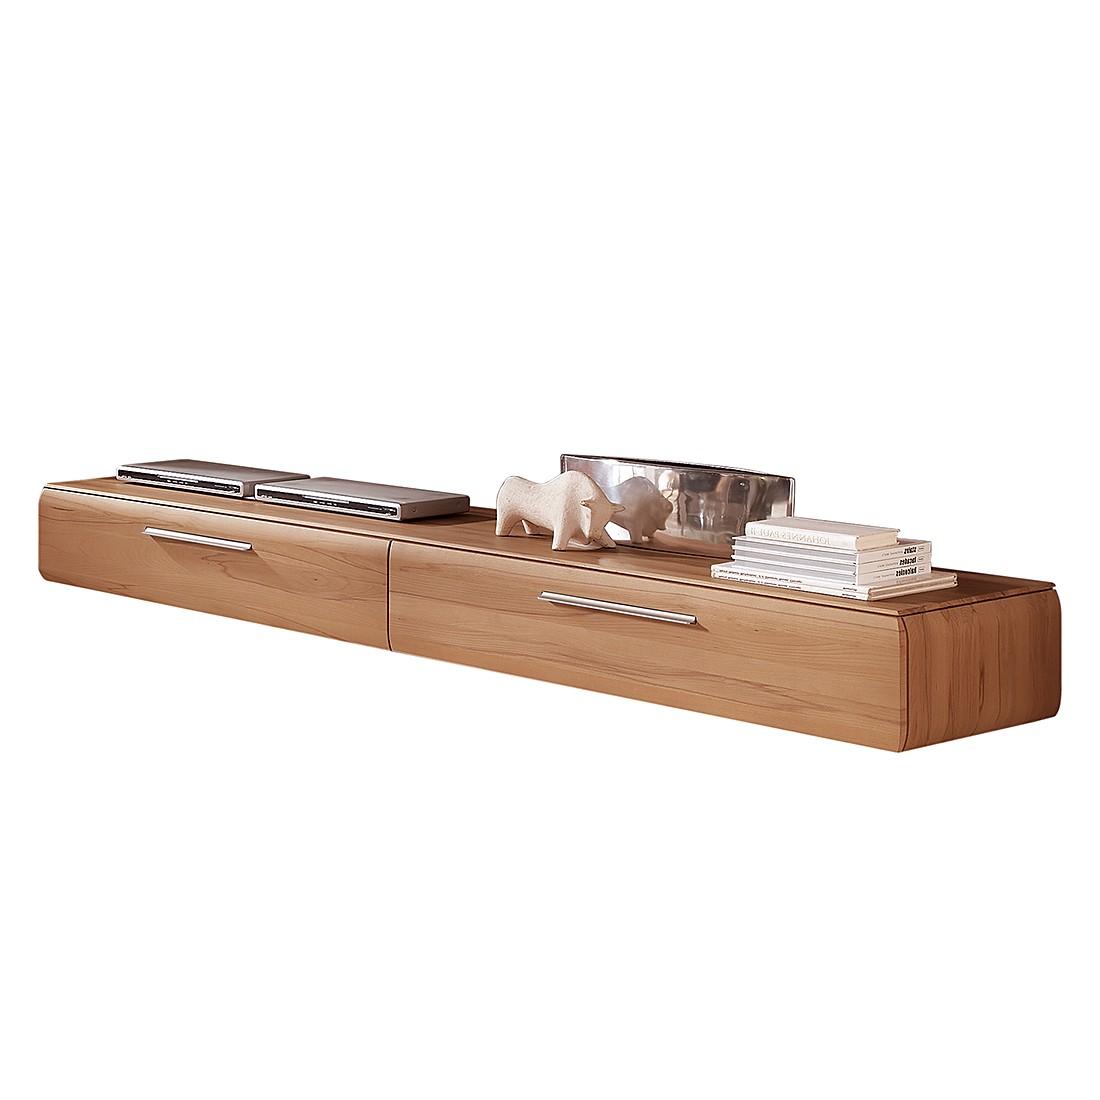 tv lowboard trento ii kernbuche massiv 220 x 27 cm hartmann online bestellen. Black Bedroom Furniture Sets. Home Design Ideas